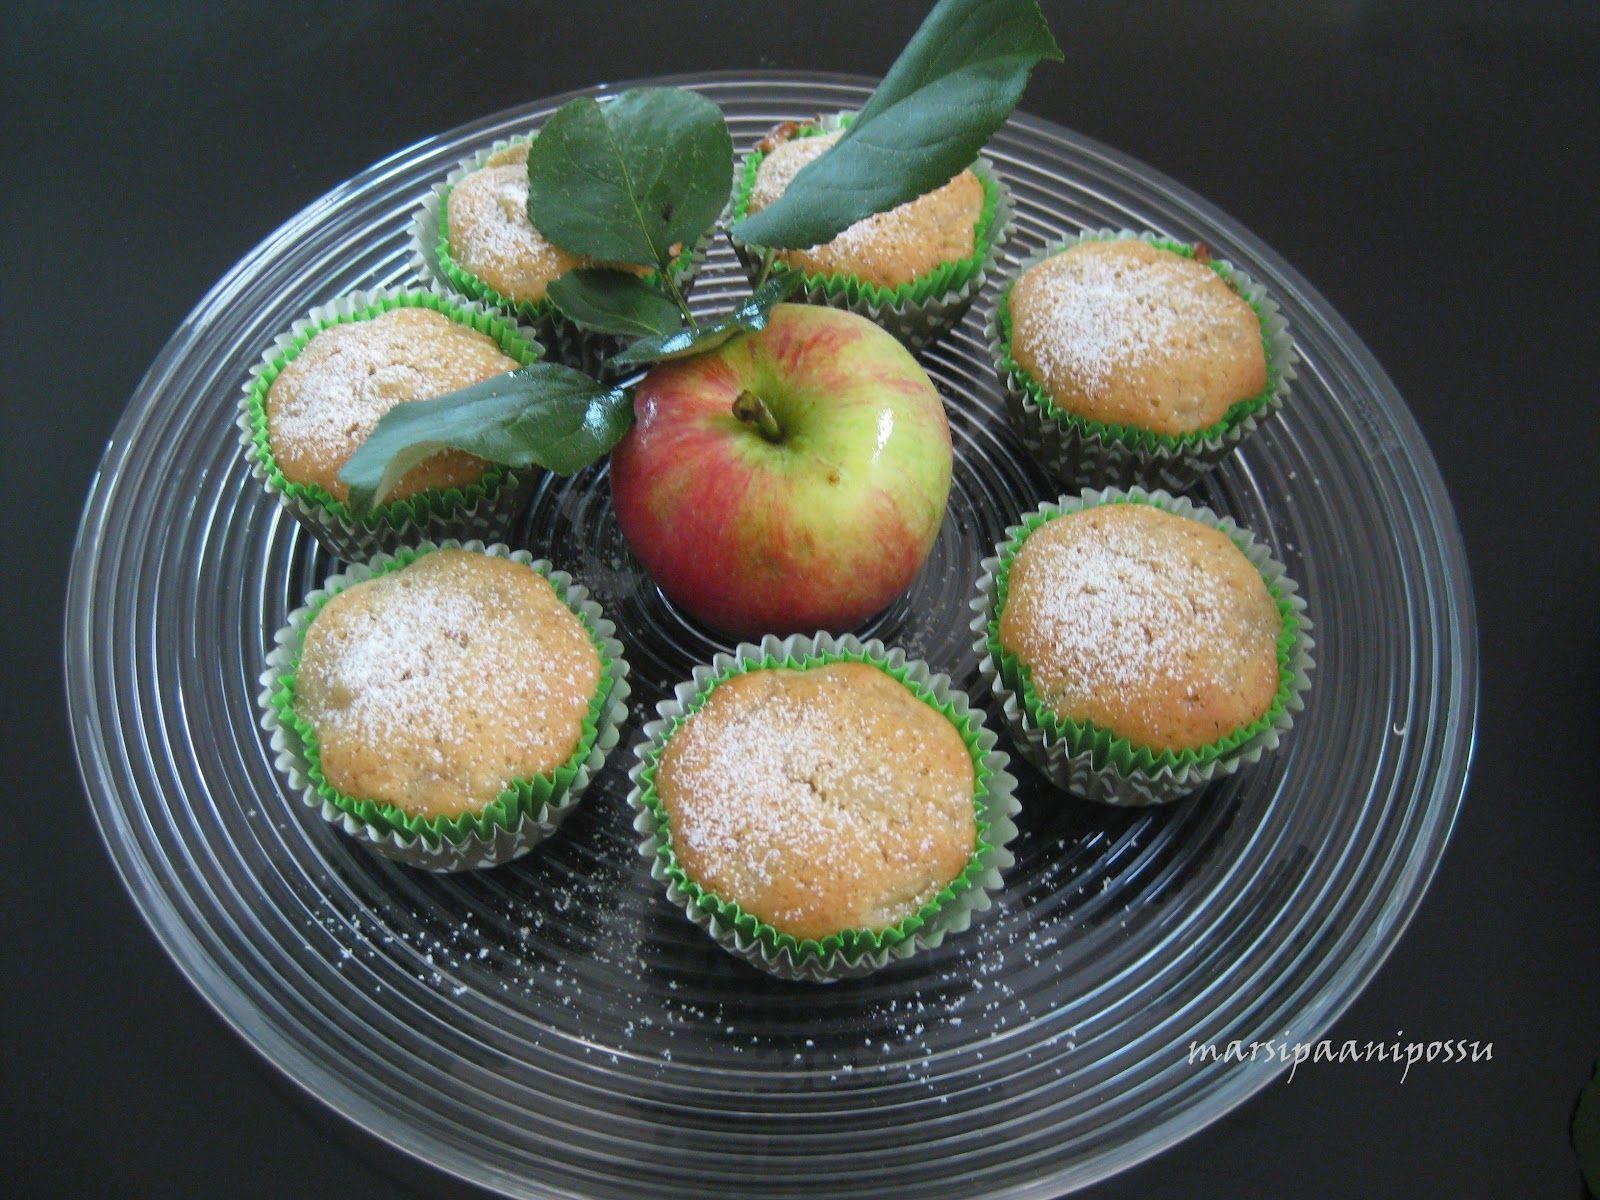 Marsipaanipossu: Omenamuffinssit